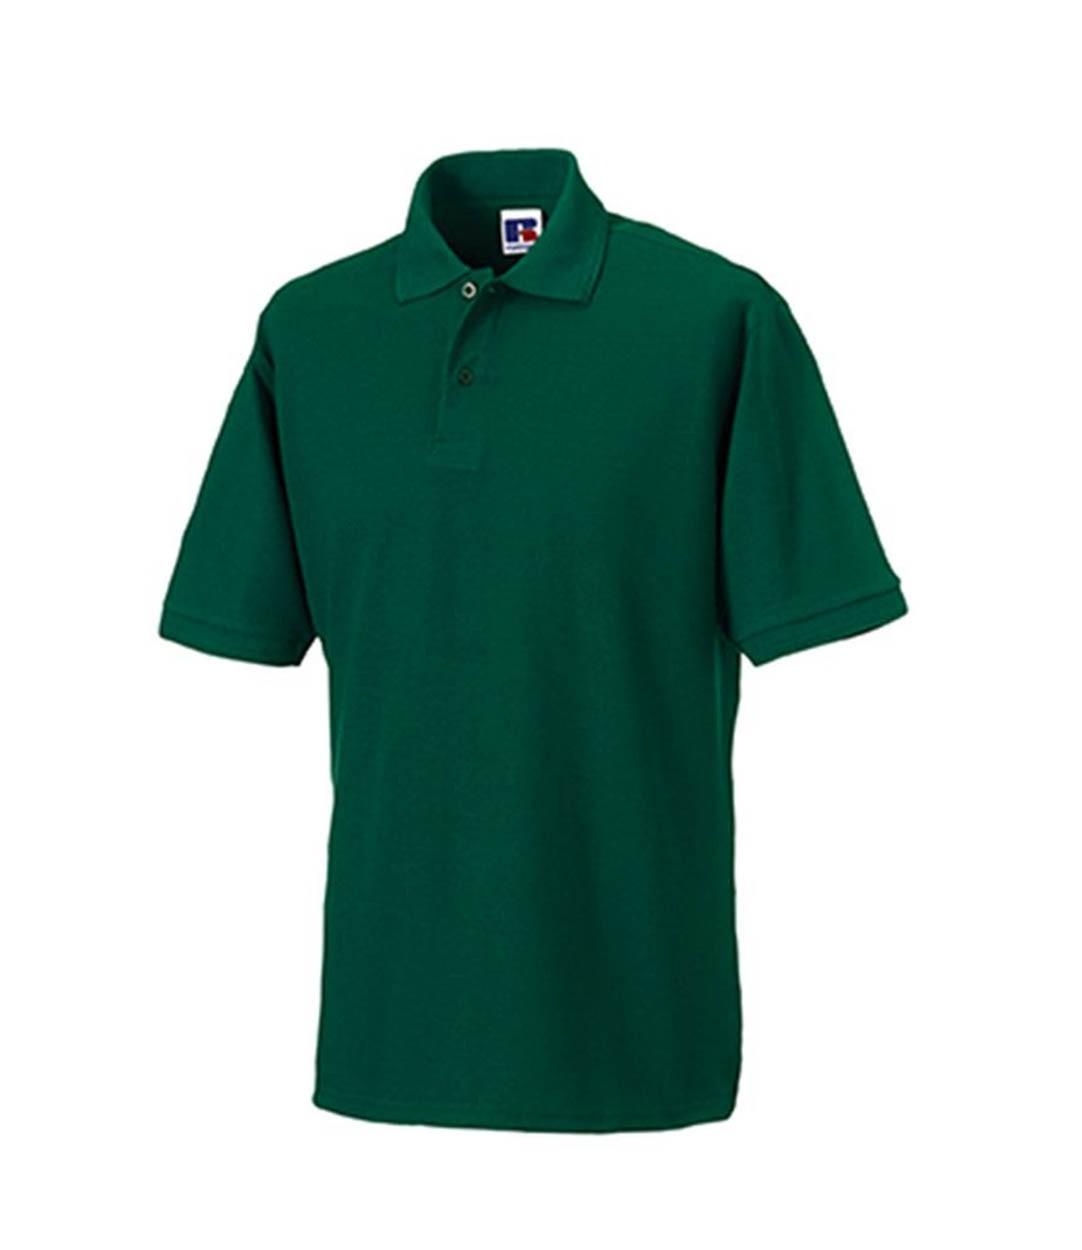 Russell Workwear 599m Hardwearing Pique Polo Shirt Plain Poly